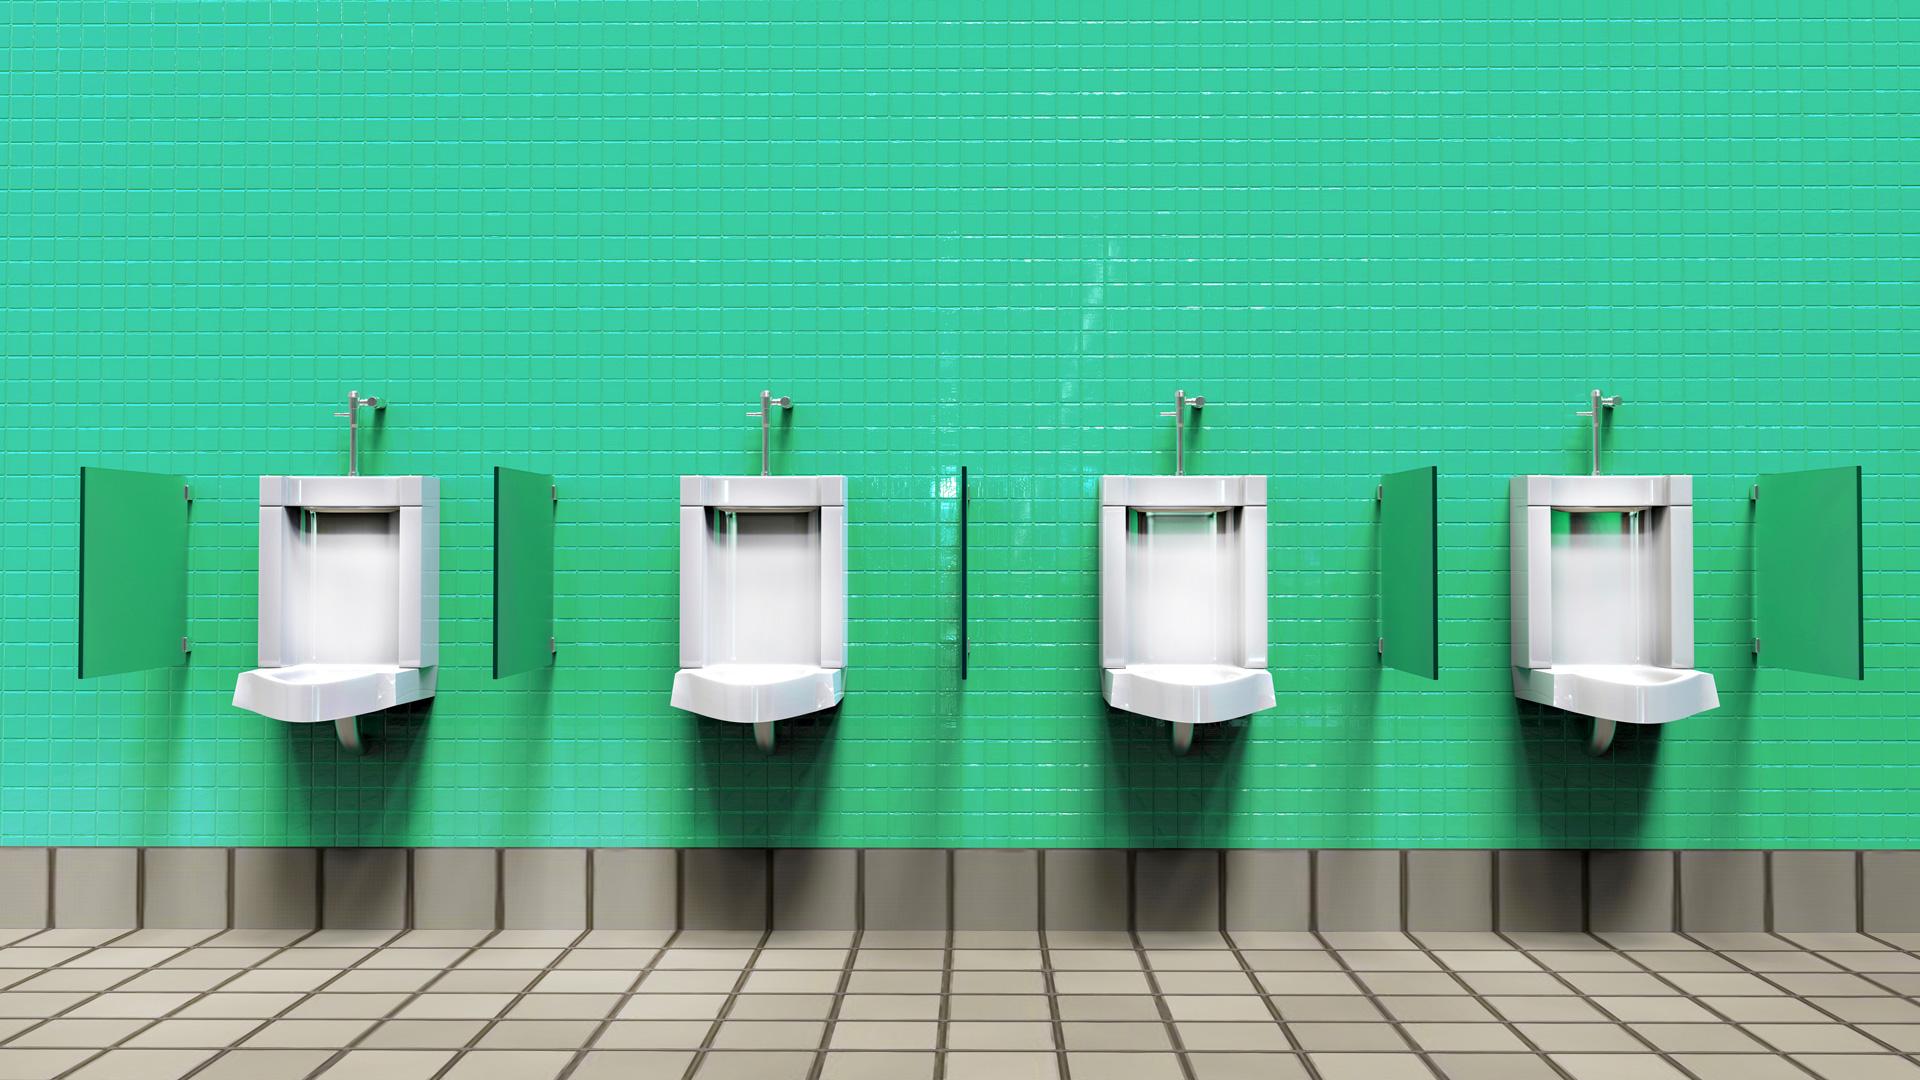 entreprise toopi organics collecte urine ecologique recyclage